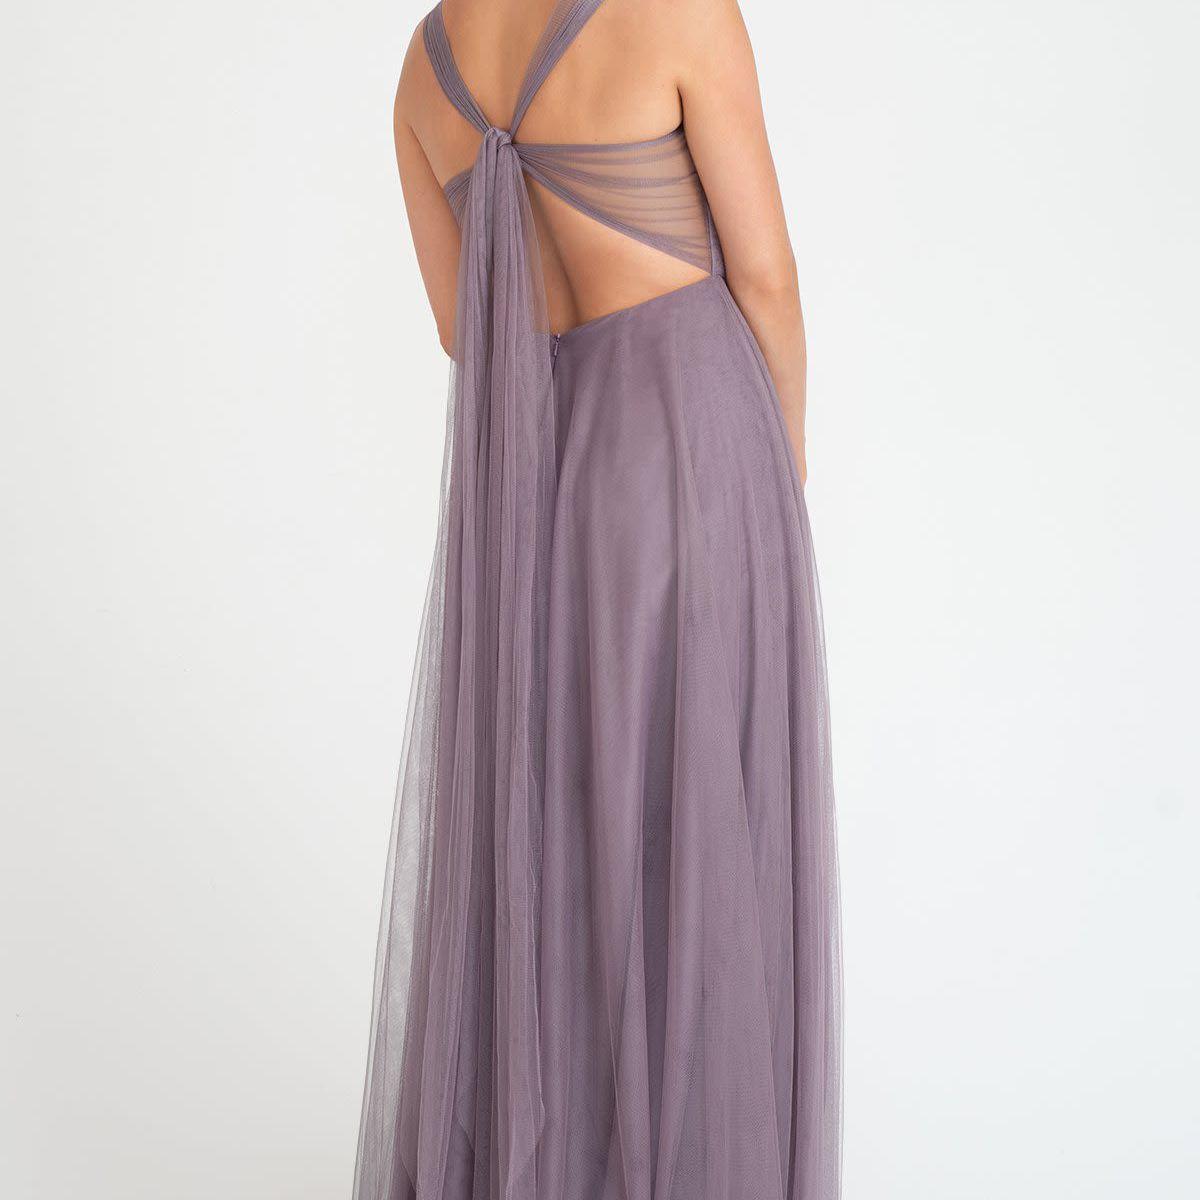 Jenny Yoo Julia Bridesmaid Dress $260